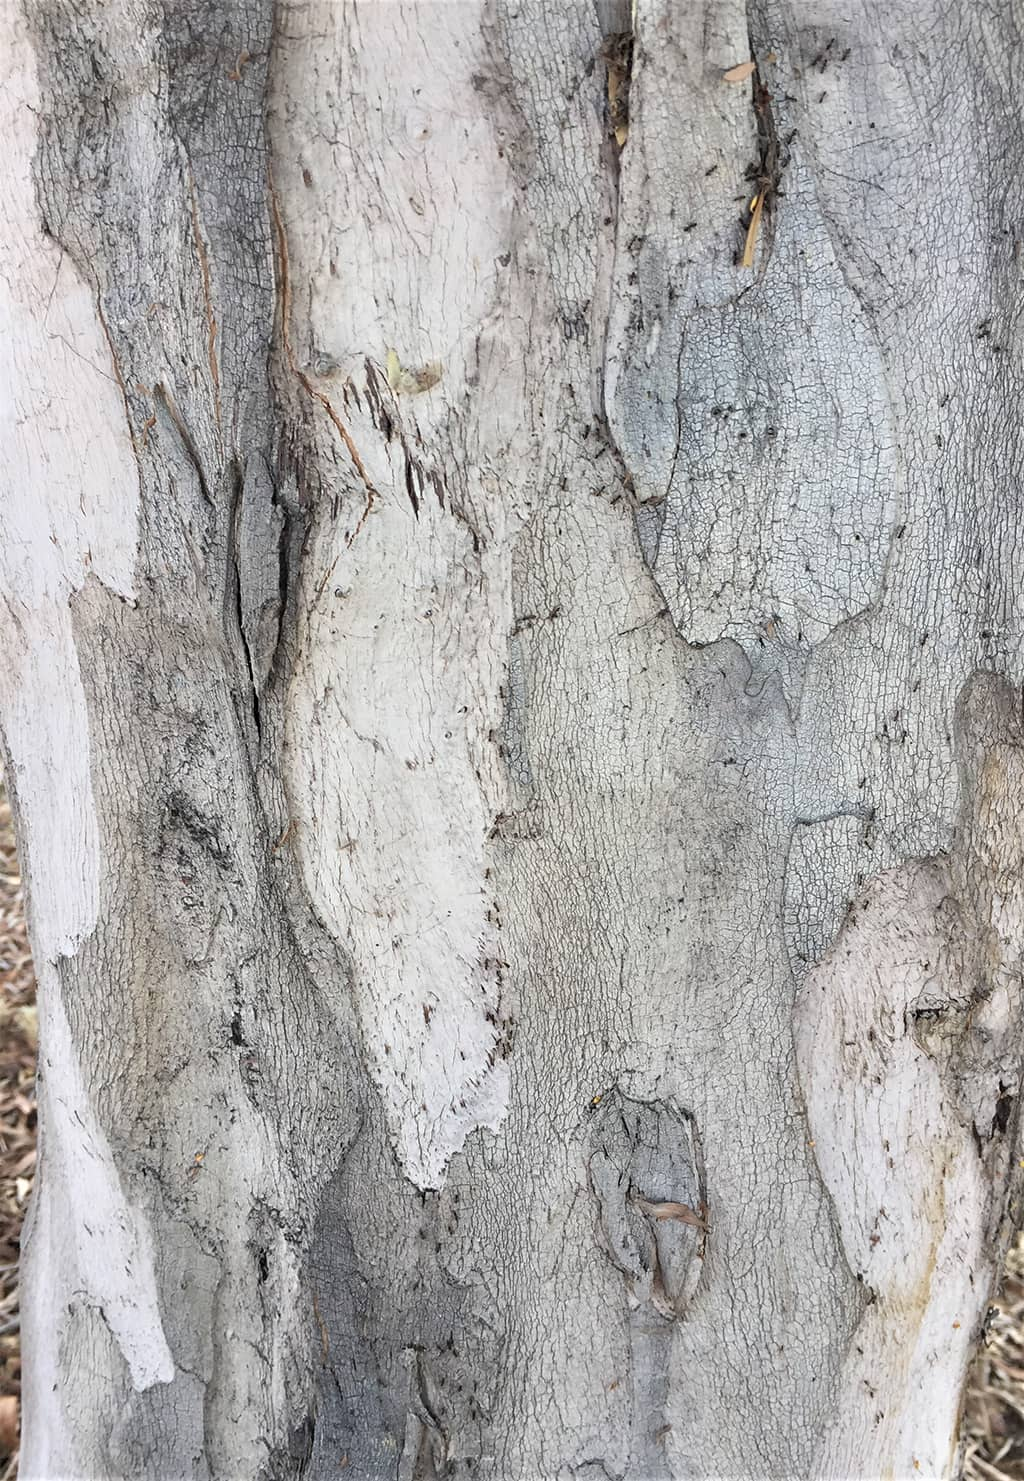 Water Gum tree bark photo by David Gress